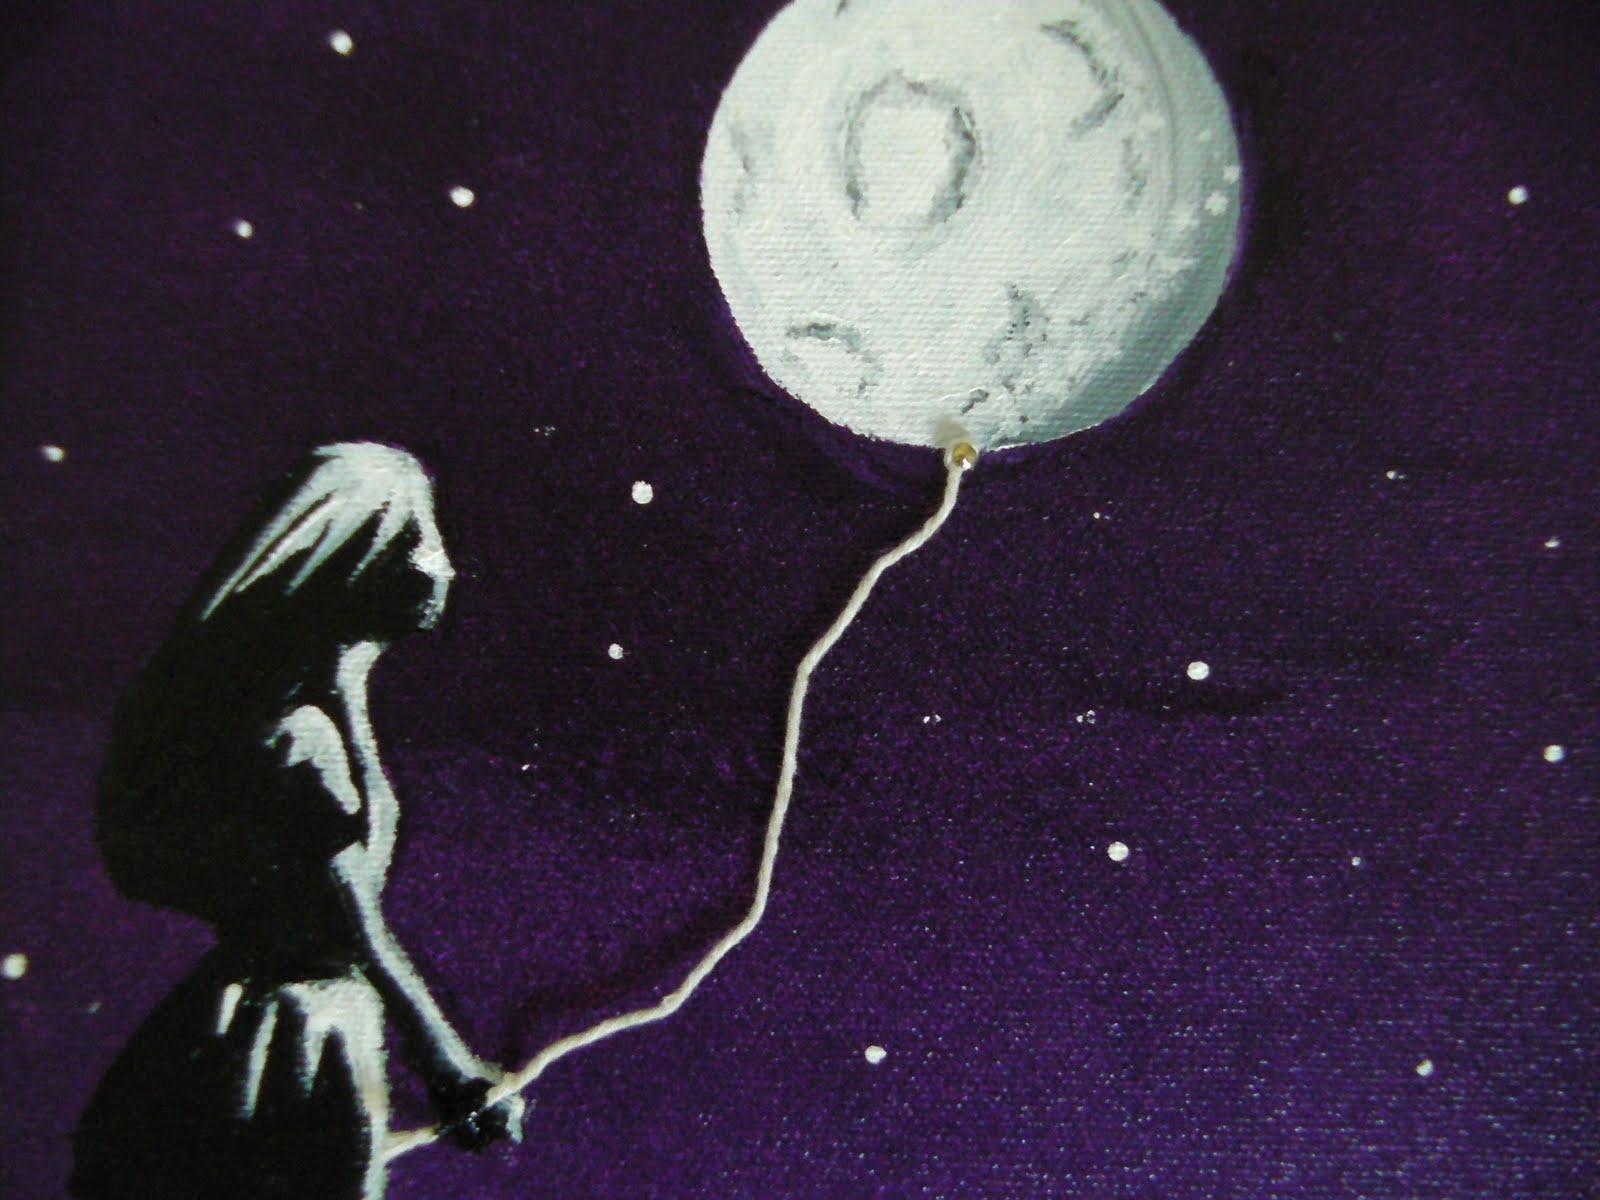 m a t t t h e n e l s o n moon balloon